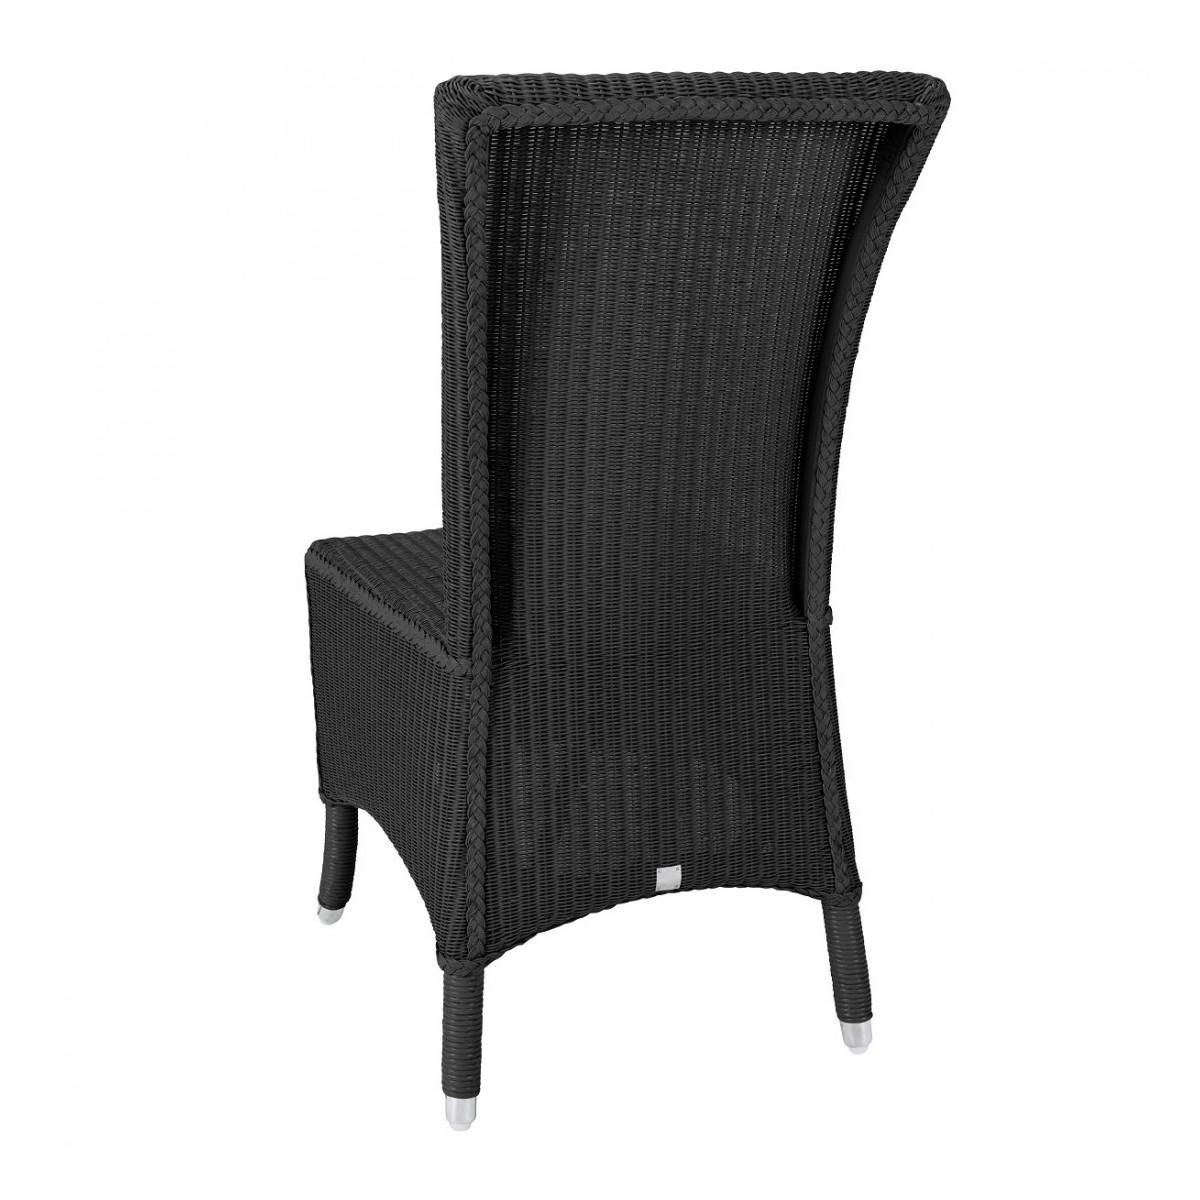 chaise mary en loom et rotin coloris noir. Black Bedroom Furniture Sets. Home Design Ideas